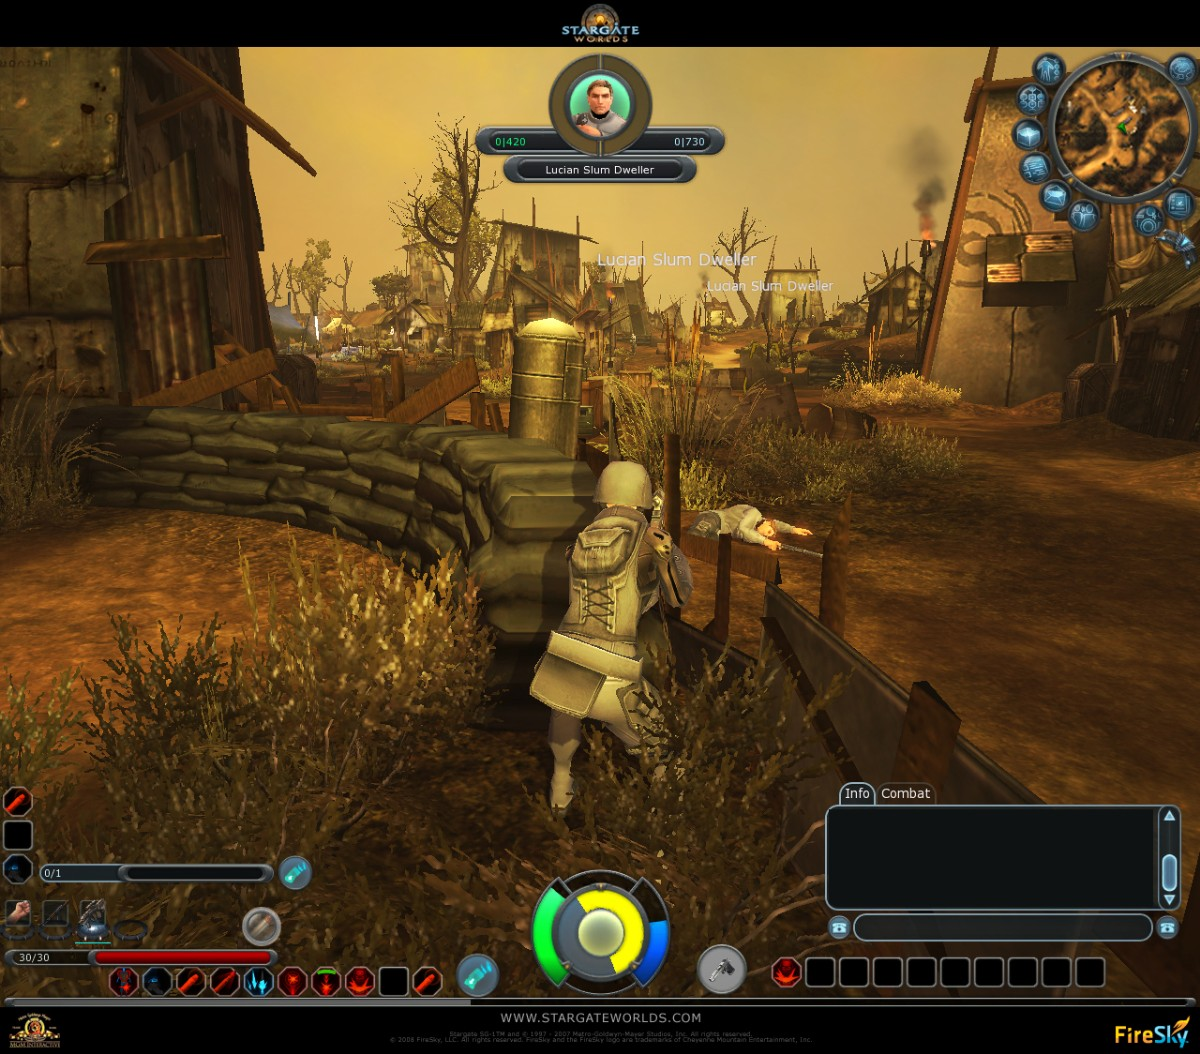 Gold miner 7 game online ps4 giochi gratis plus aprile